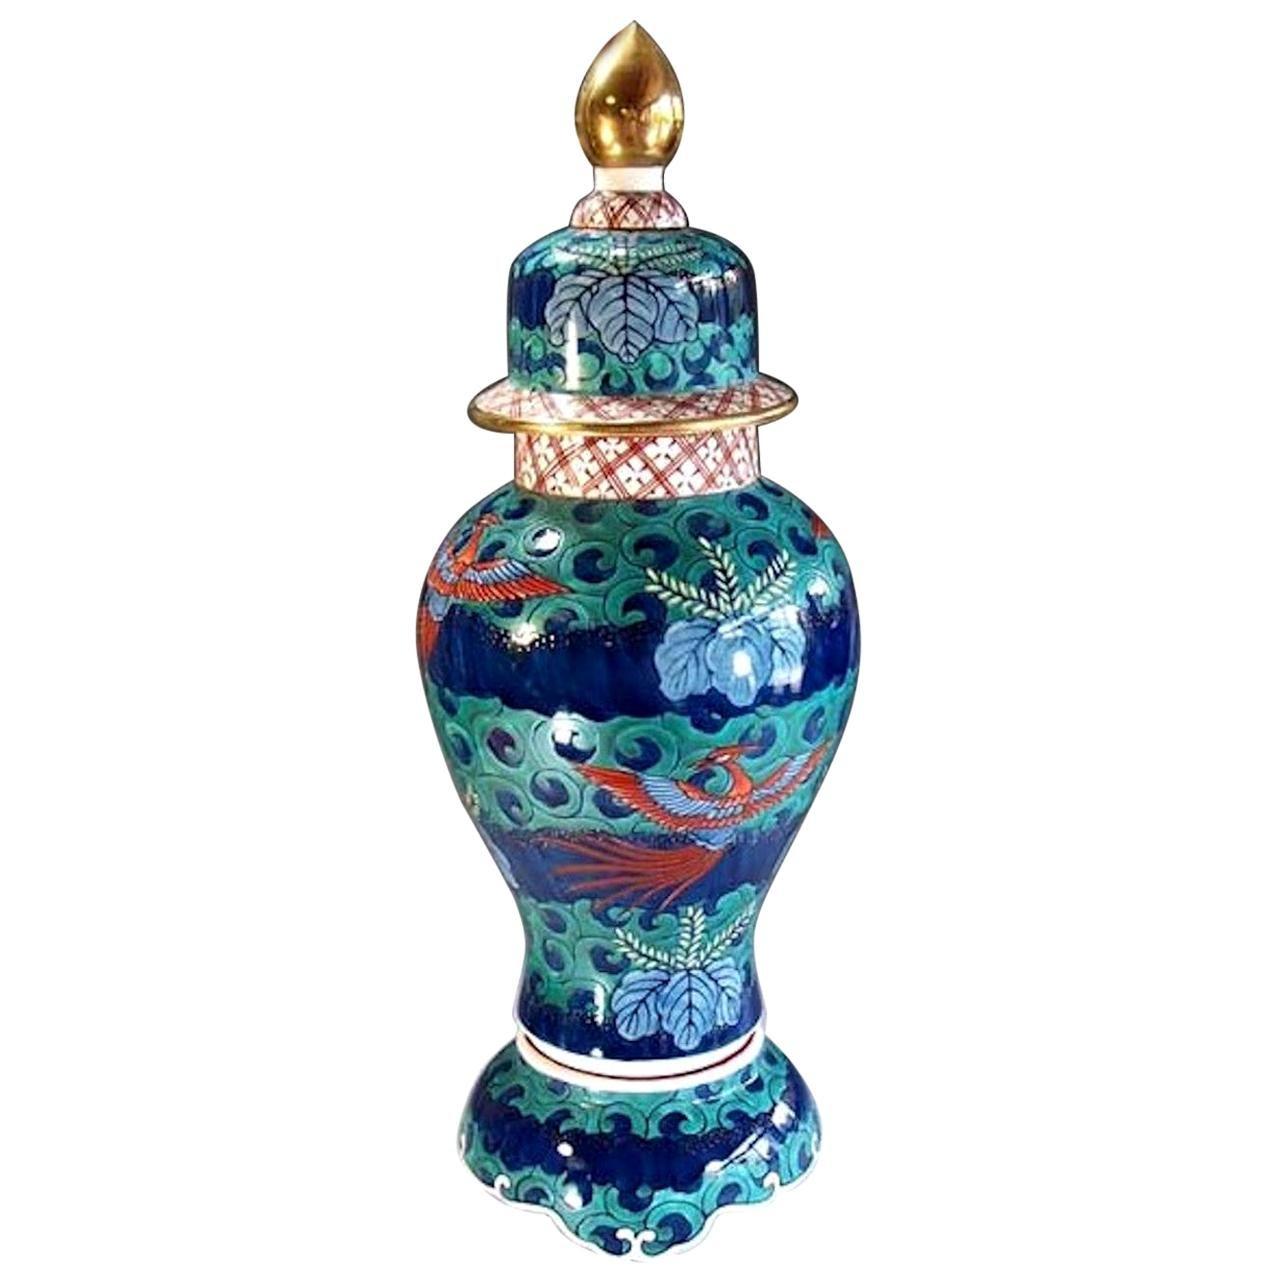 Green Blue Three-Piece Porcelain Lidded Jar by Japanese Master Artist